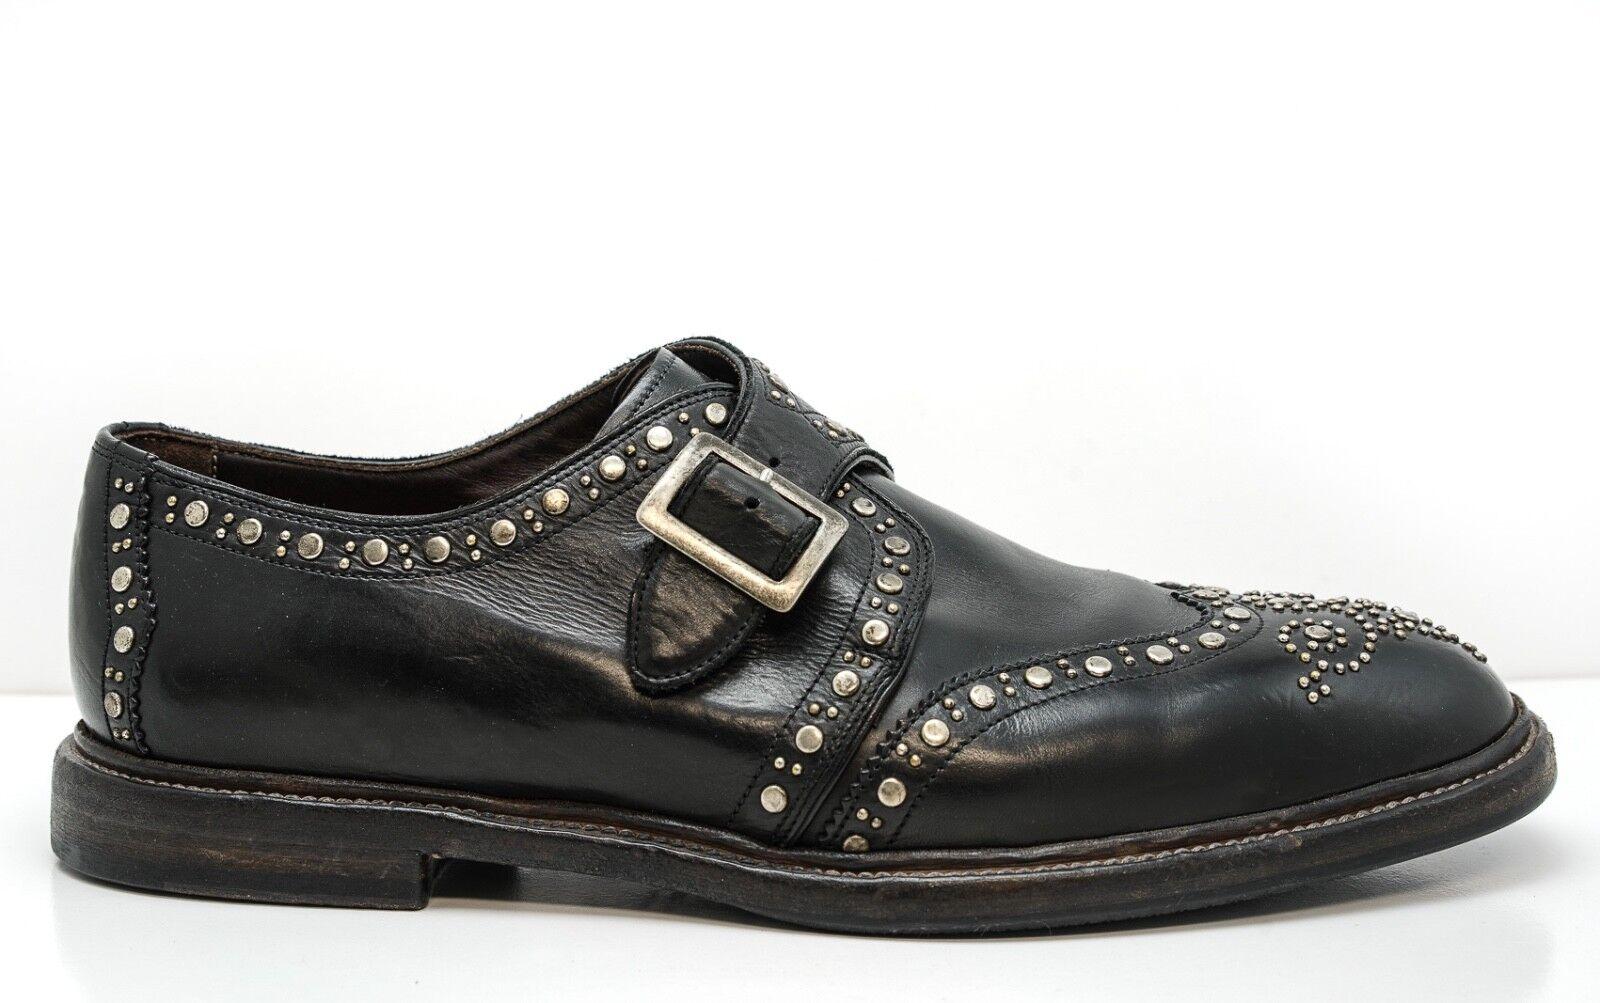 New in Box Dolce & Gabbana Men's Black Stud Shoes CA10114